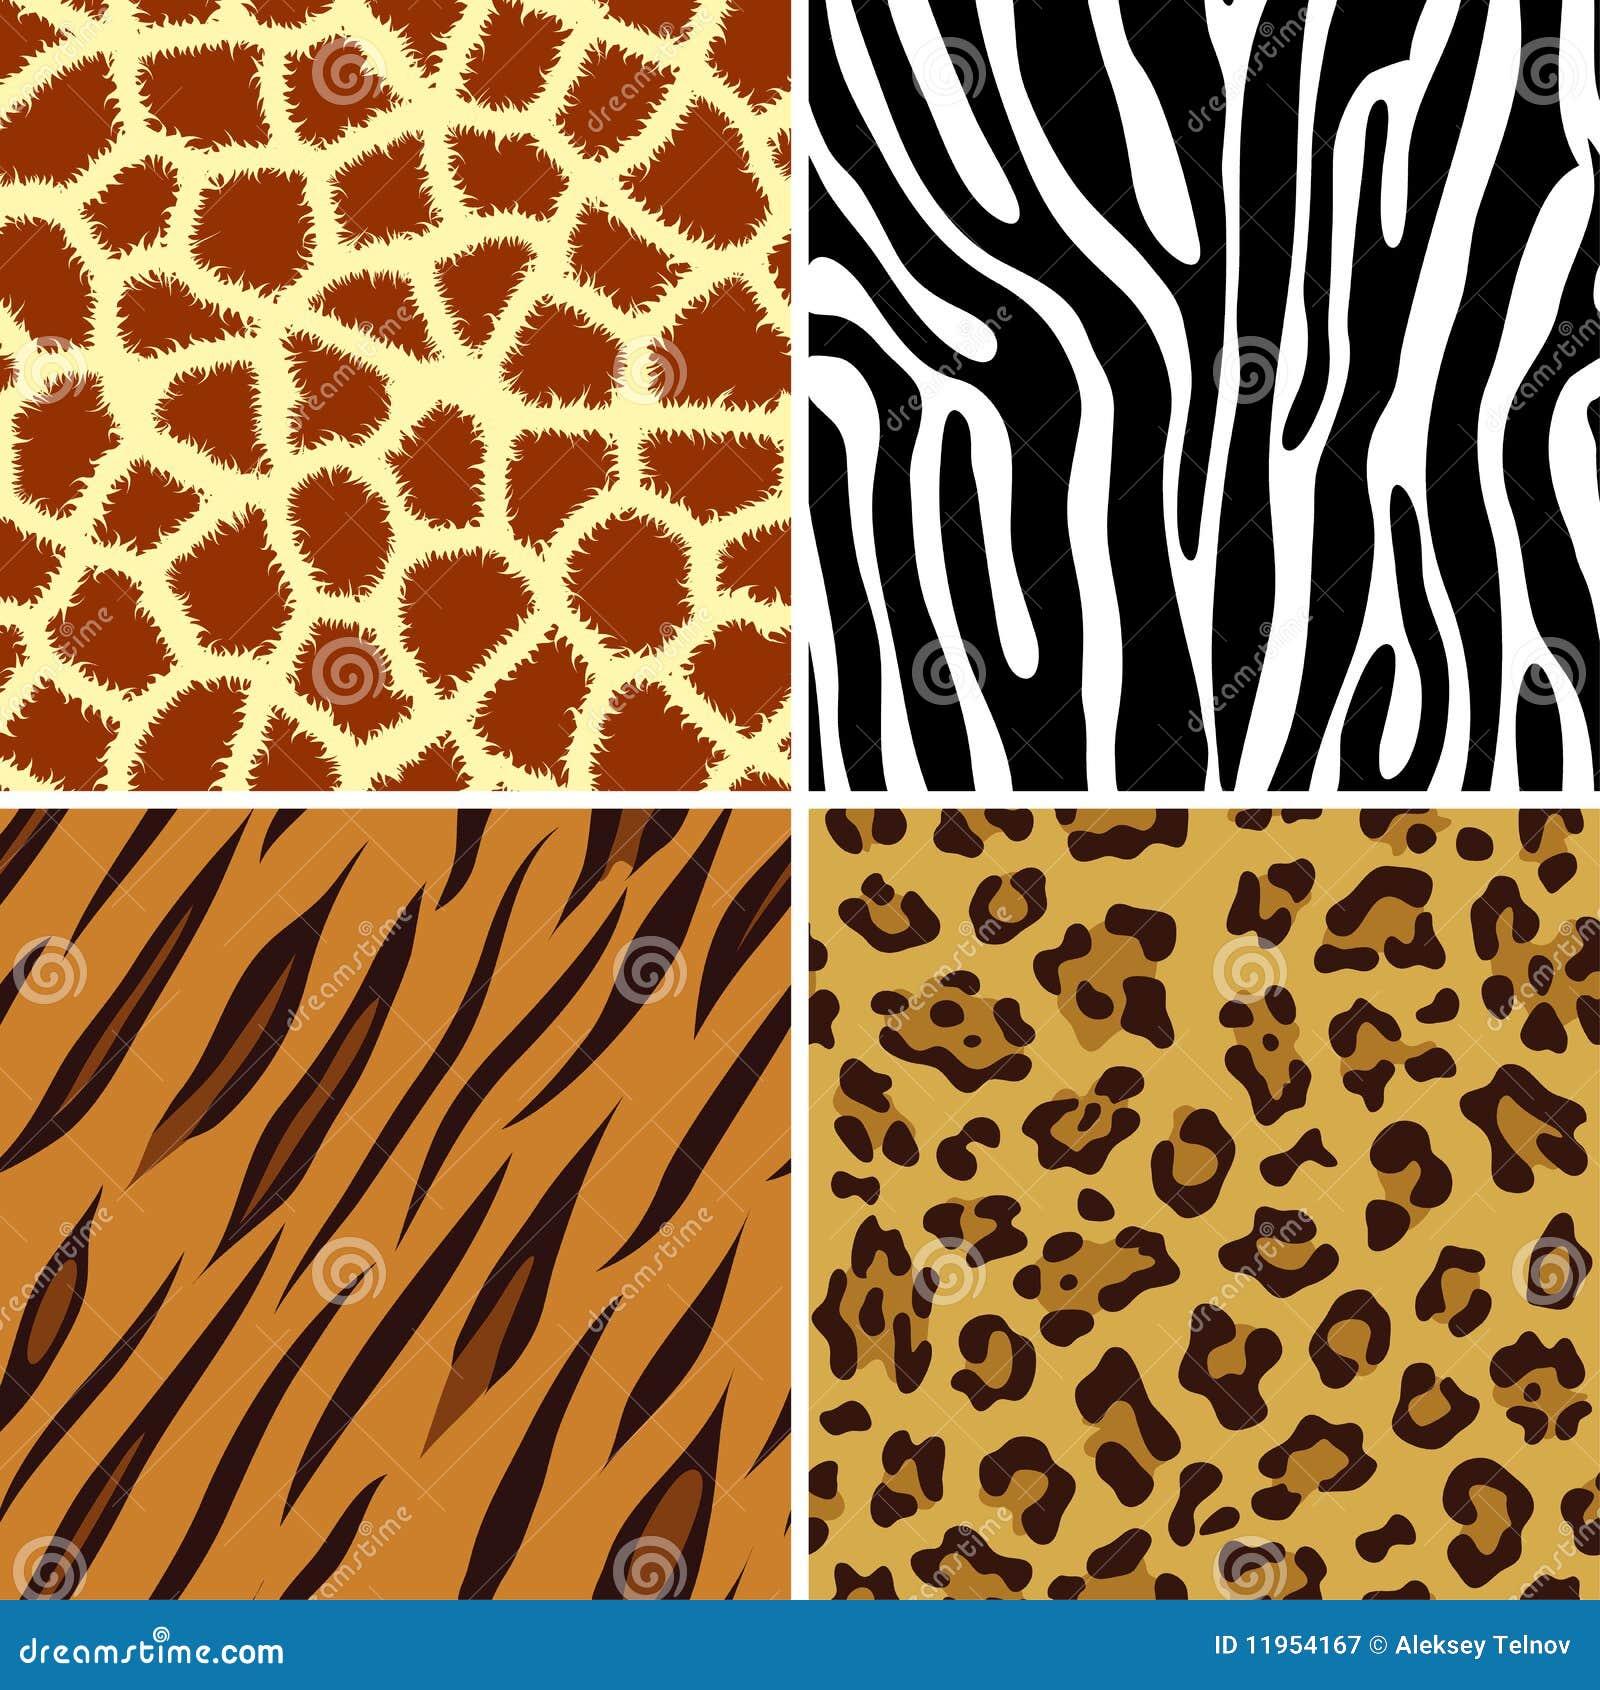 animal four giraffe illustration leopard print